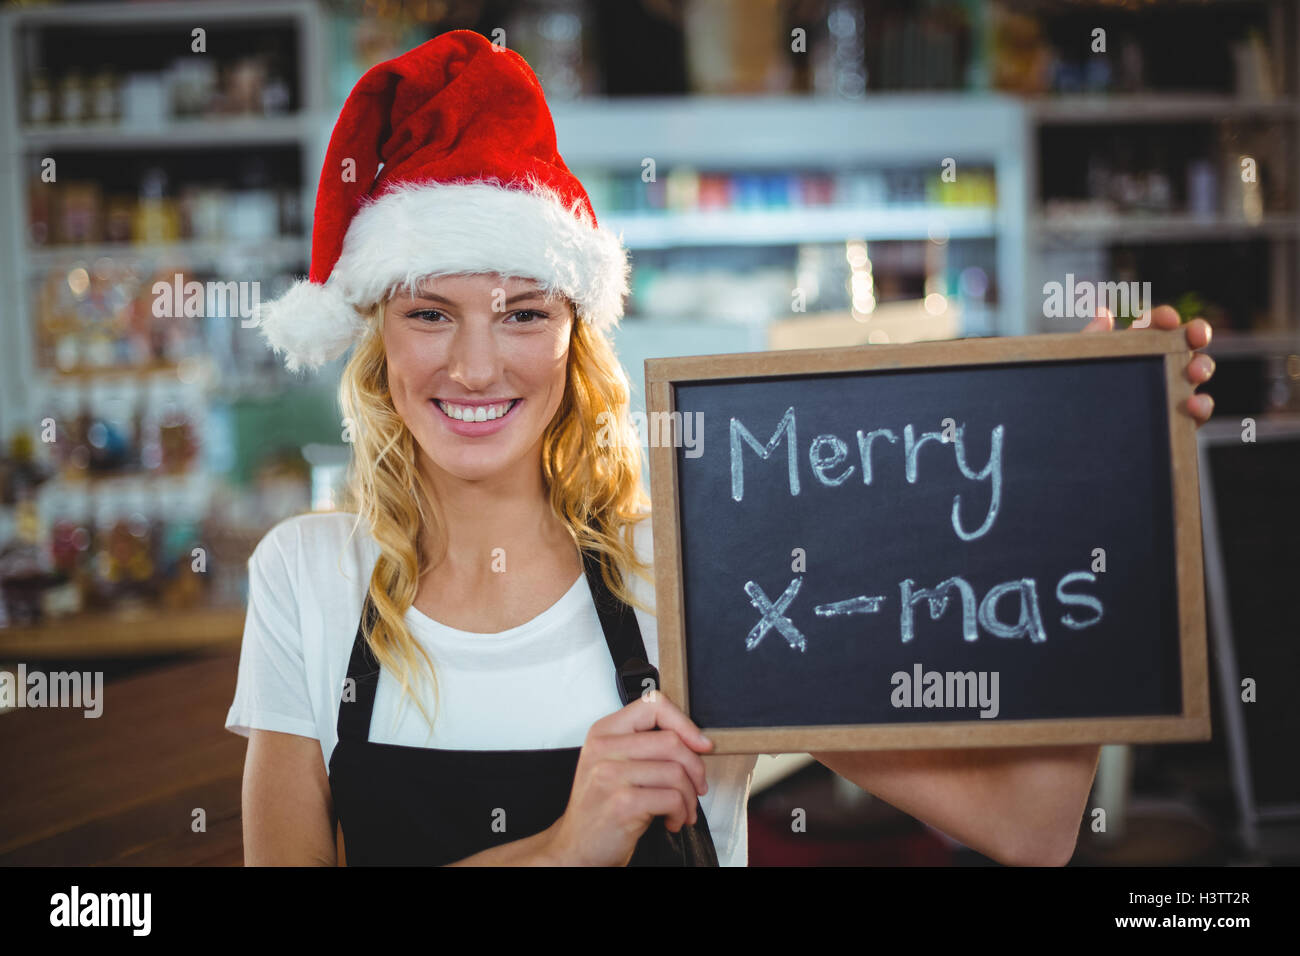 Retrato de camarera mostrando pizarra con merry X-mas firmar Imagen De Stock